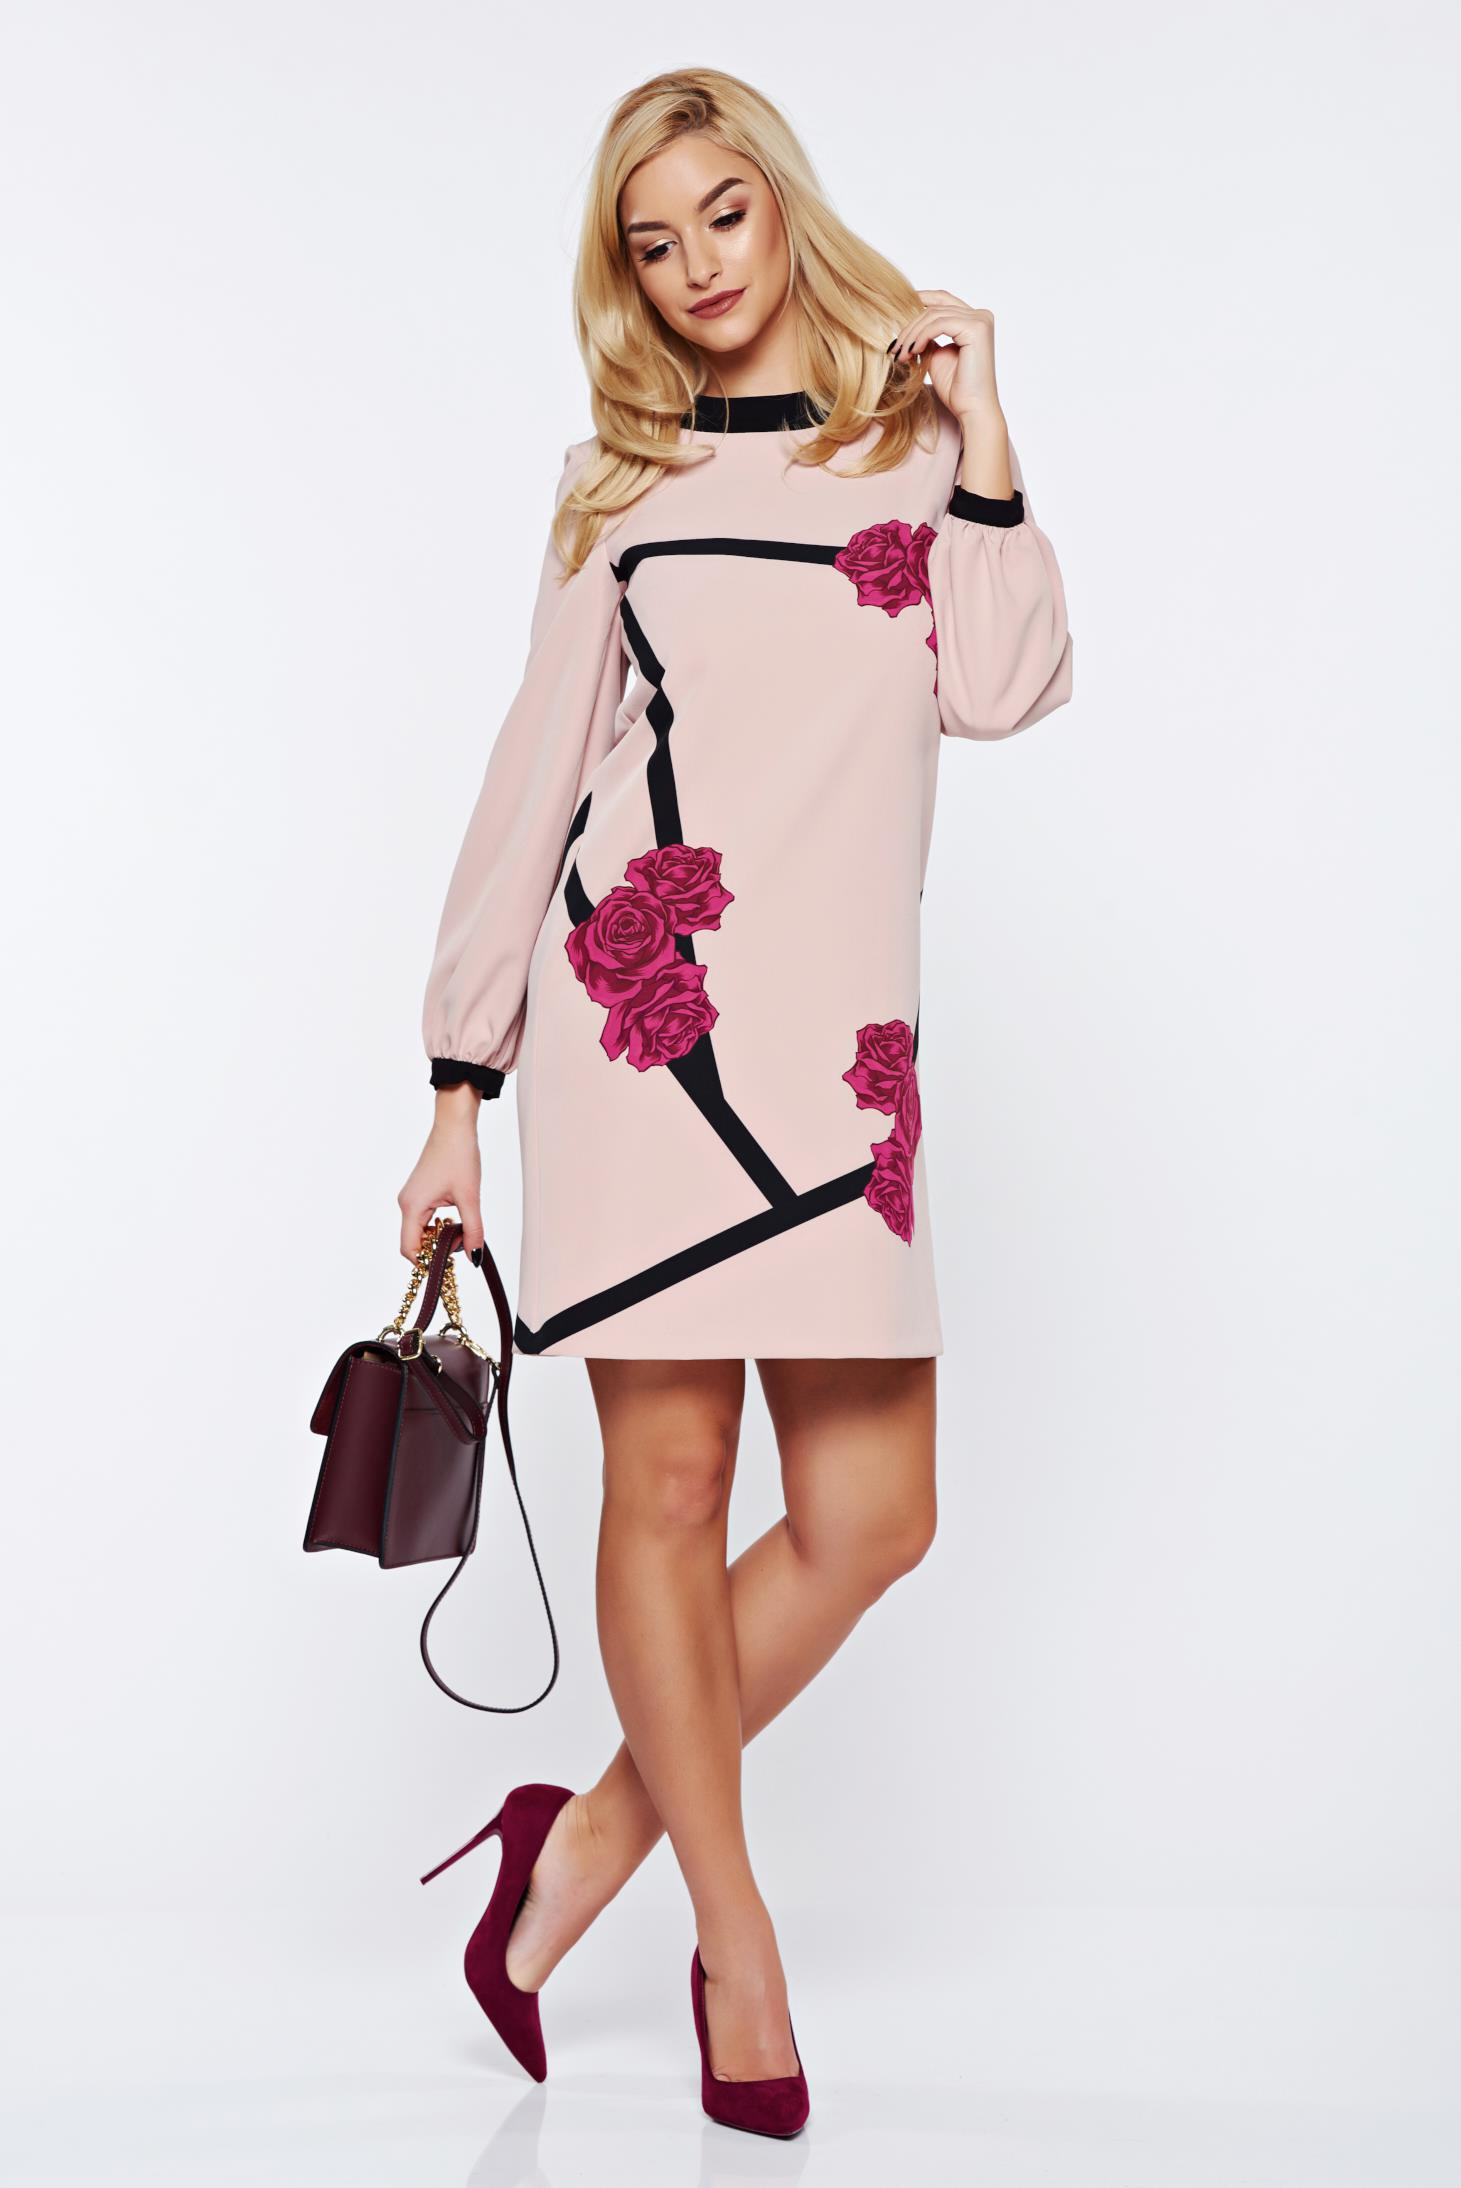 Rochie StarShinerS timeless romance rosa cu imprimeu floral eleganta cu croi larg